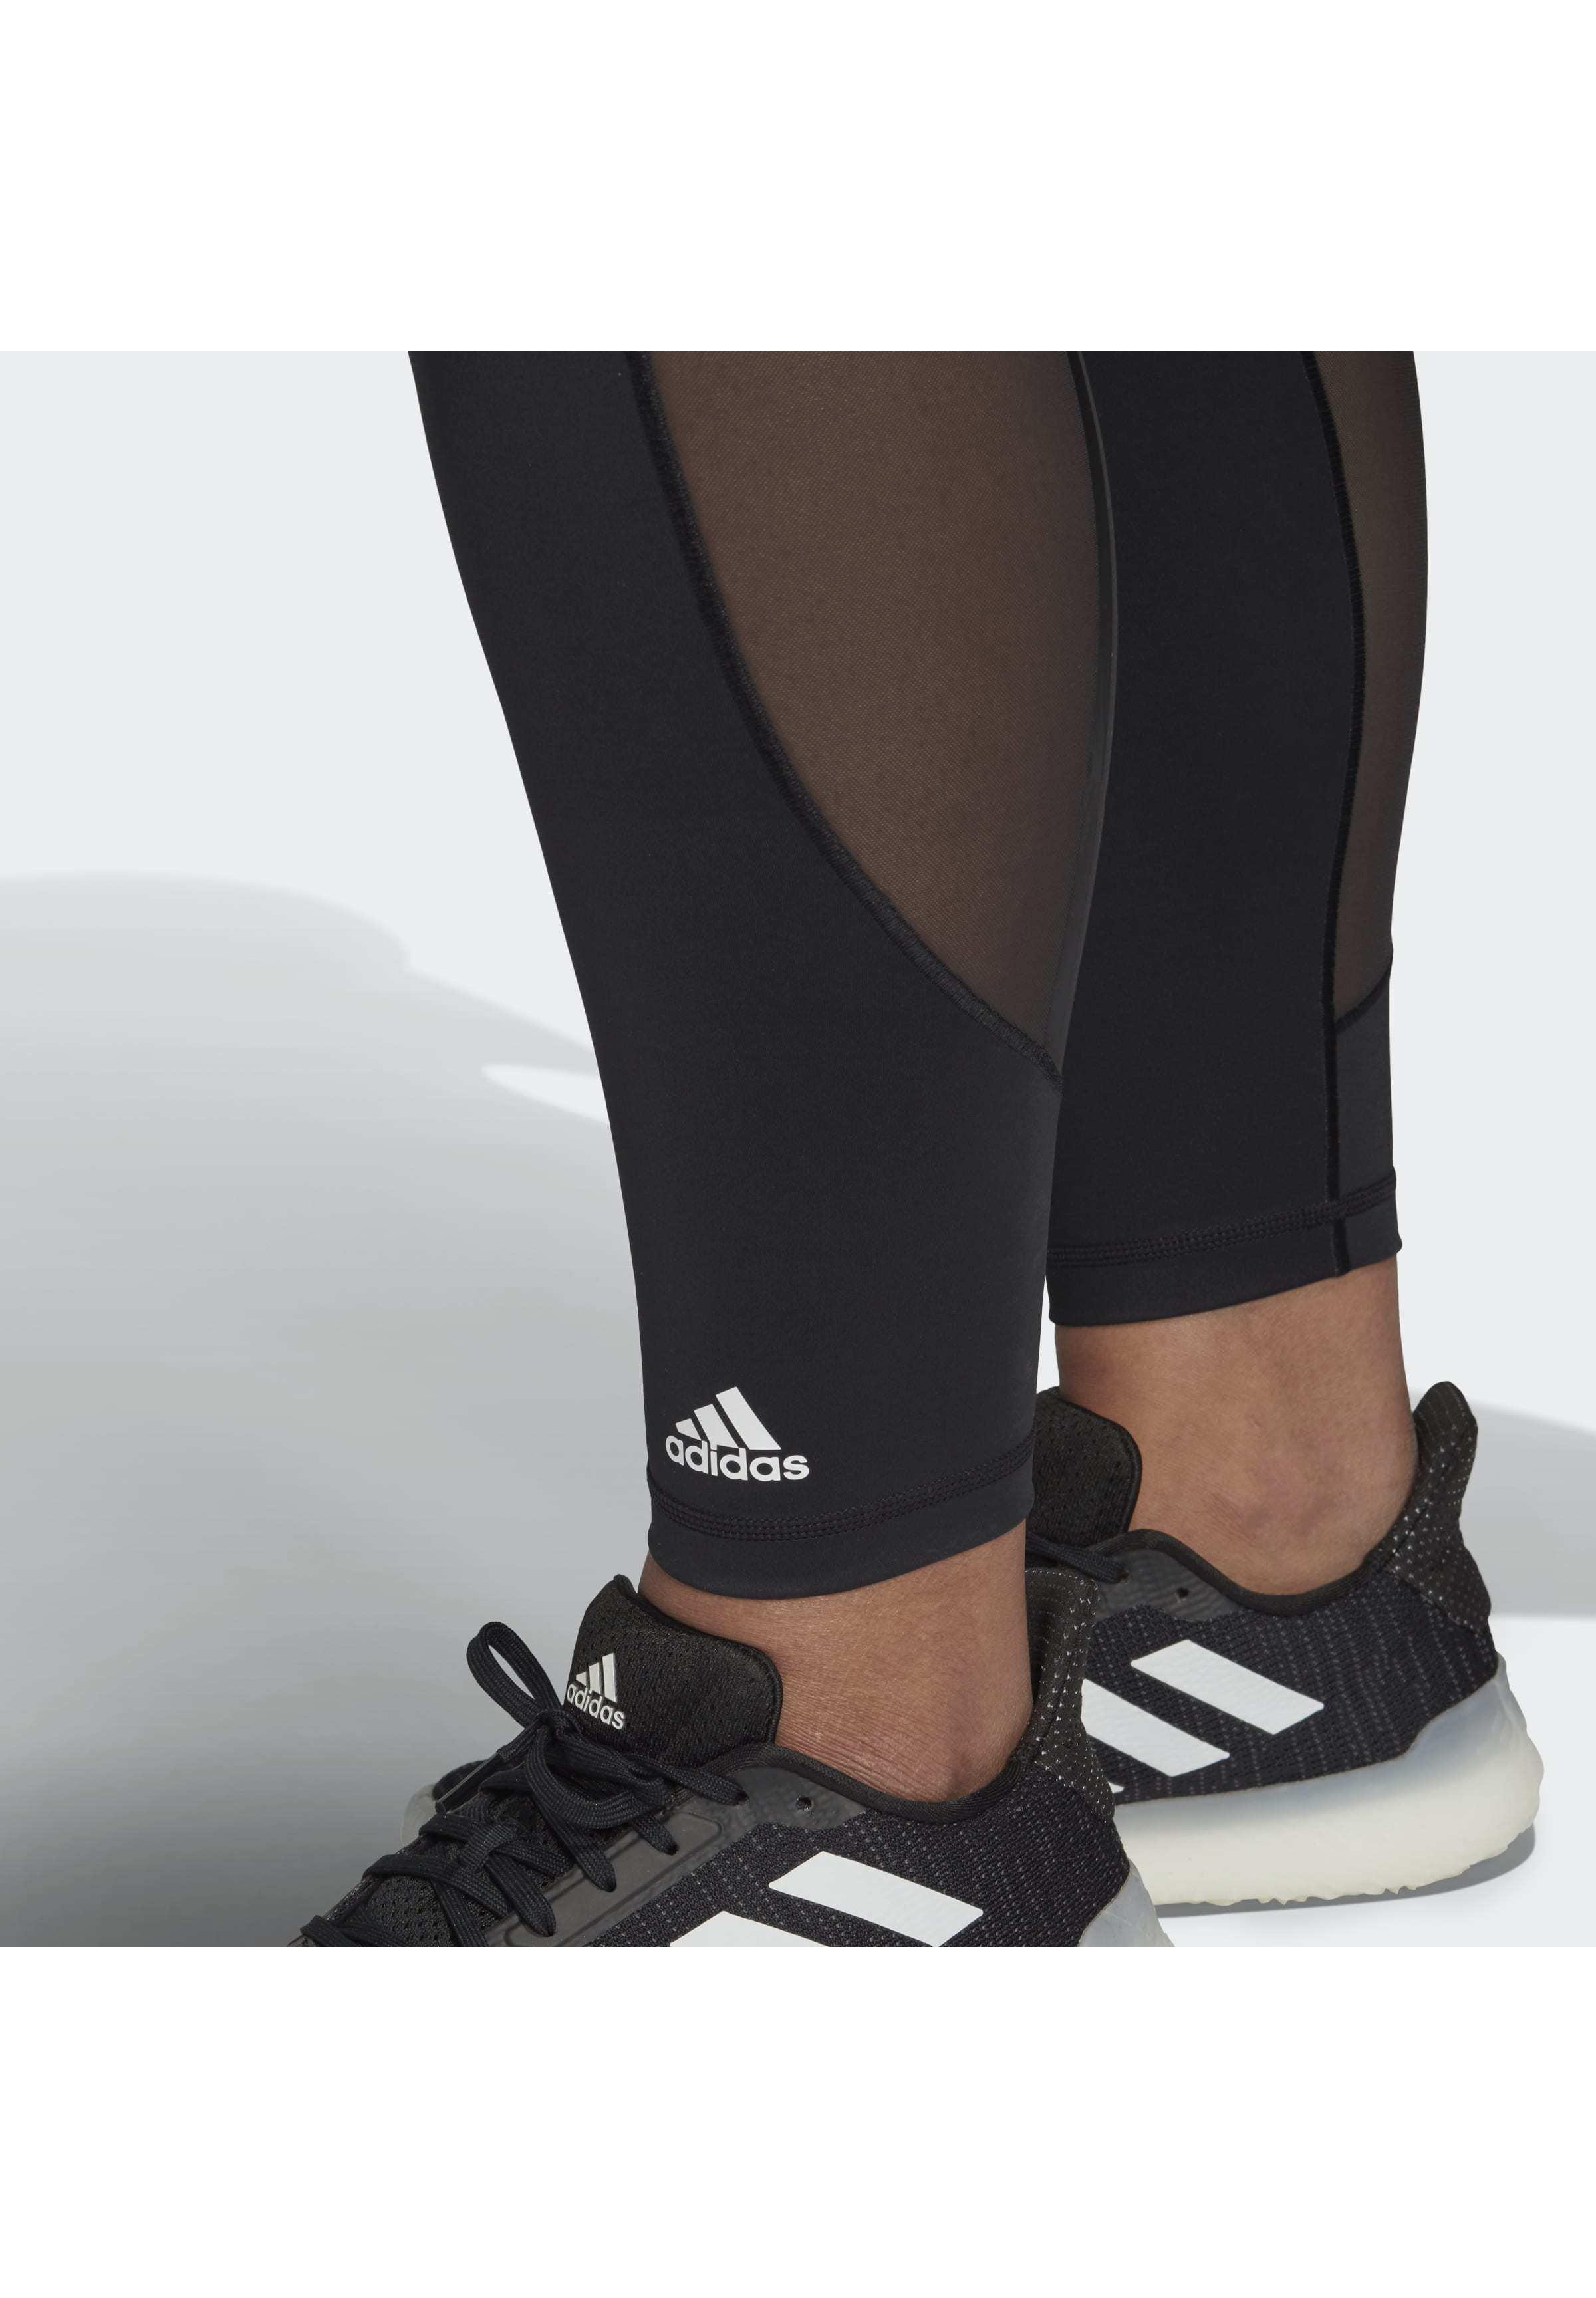 Adidas Performance Believe This 3-stripes Mesh Long Leggings (plus Size) - Medias Black